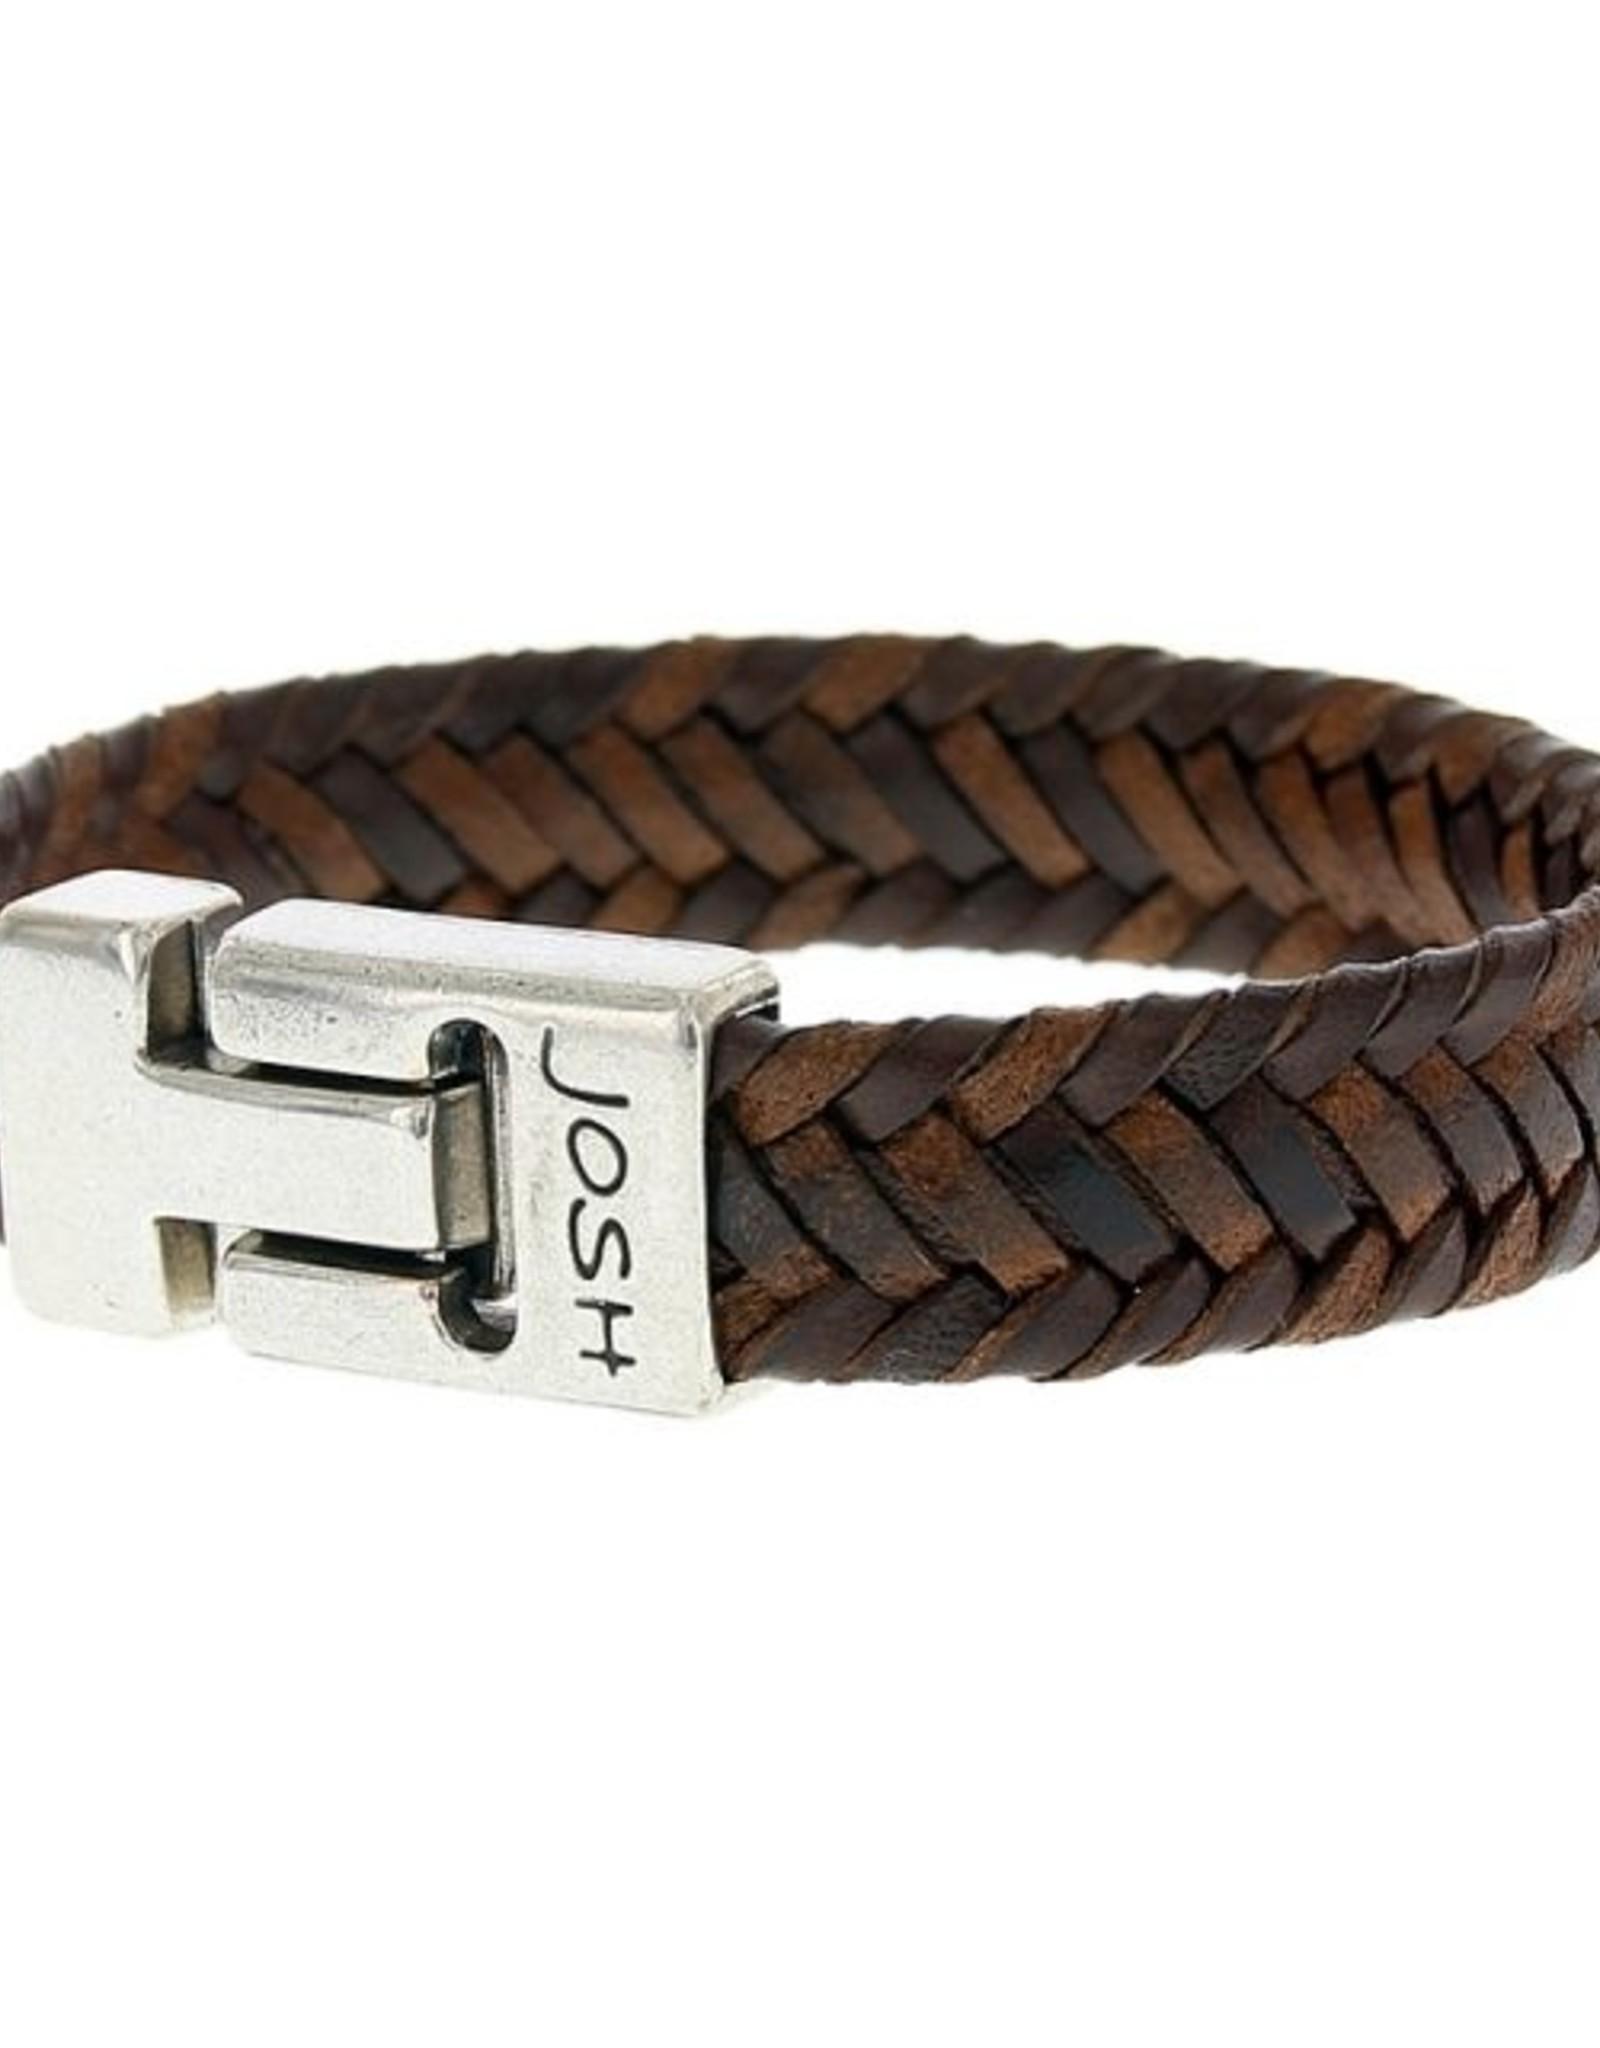 Josh 24825 brown